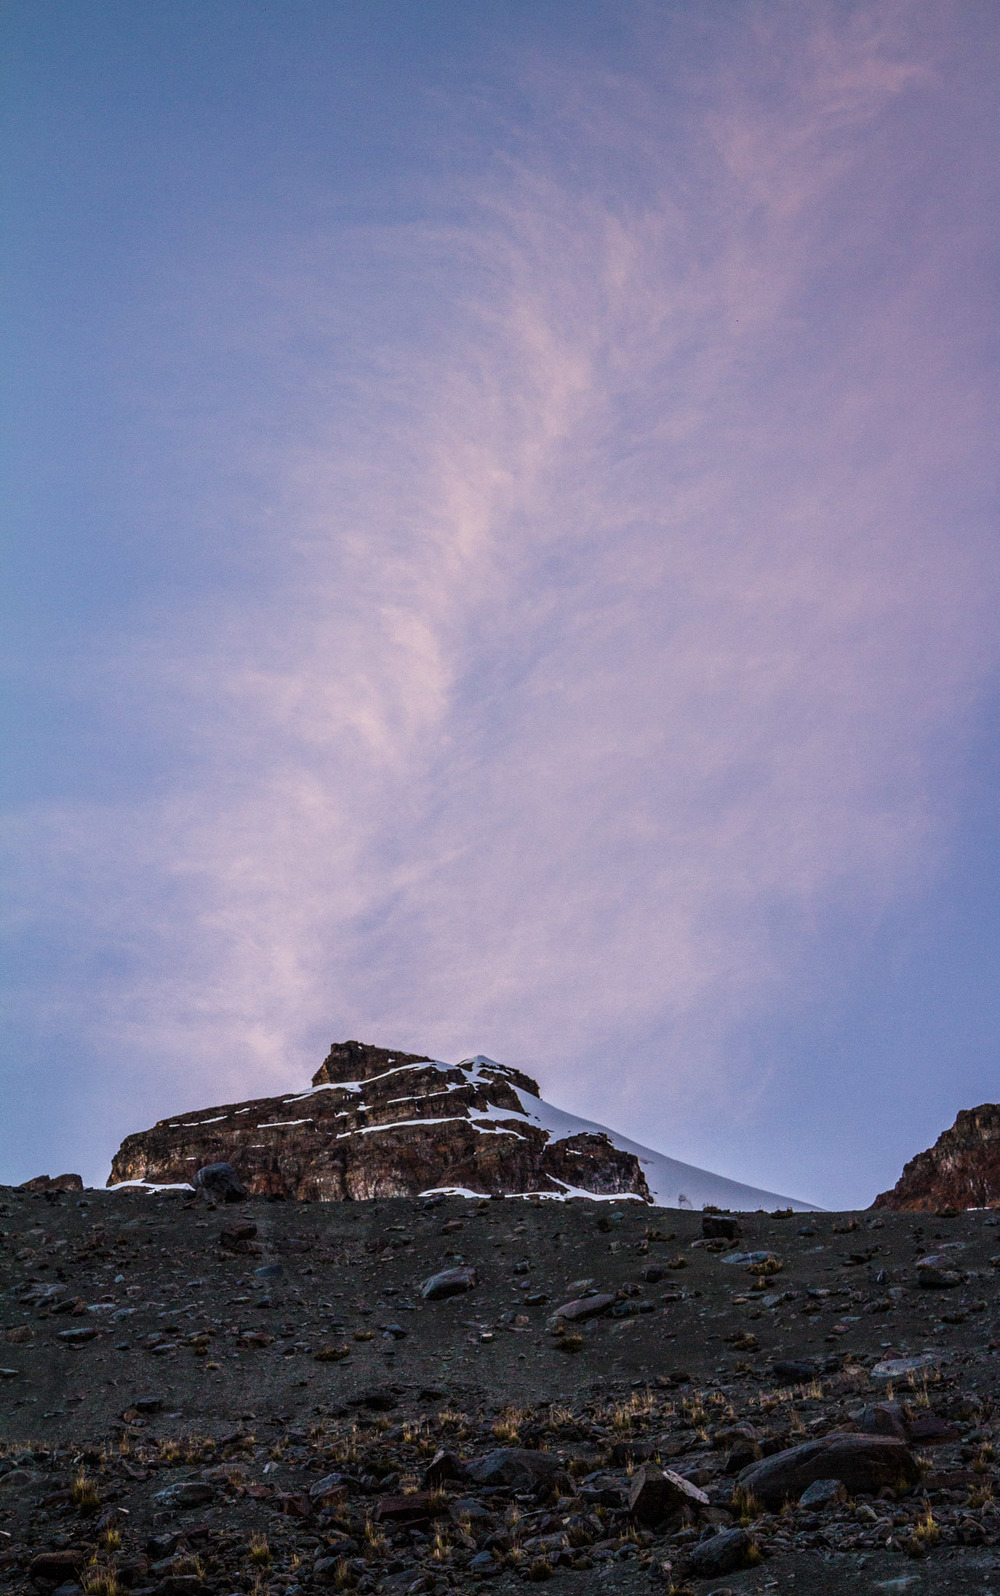 Ali-Barqawi-Studios-Explore-Series-Travel-Adventure-Documentary-C4CGAZA-Bolivia-Mount-Tarija-2015-139.jpg